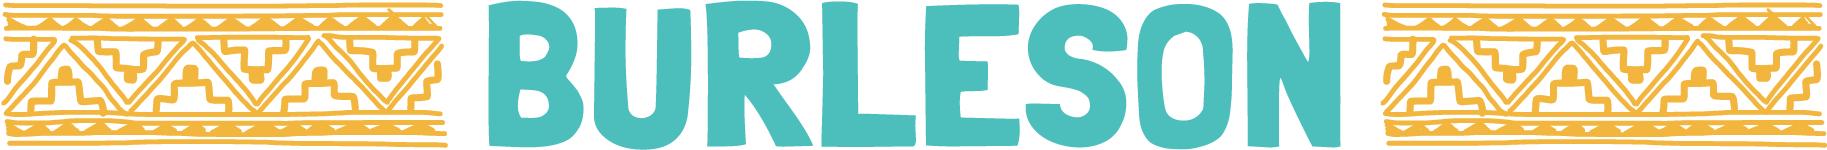 burleson-header-banner